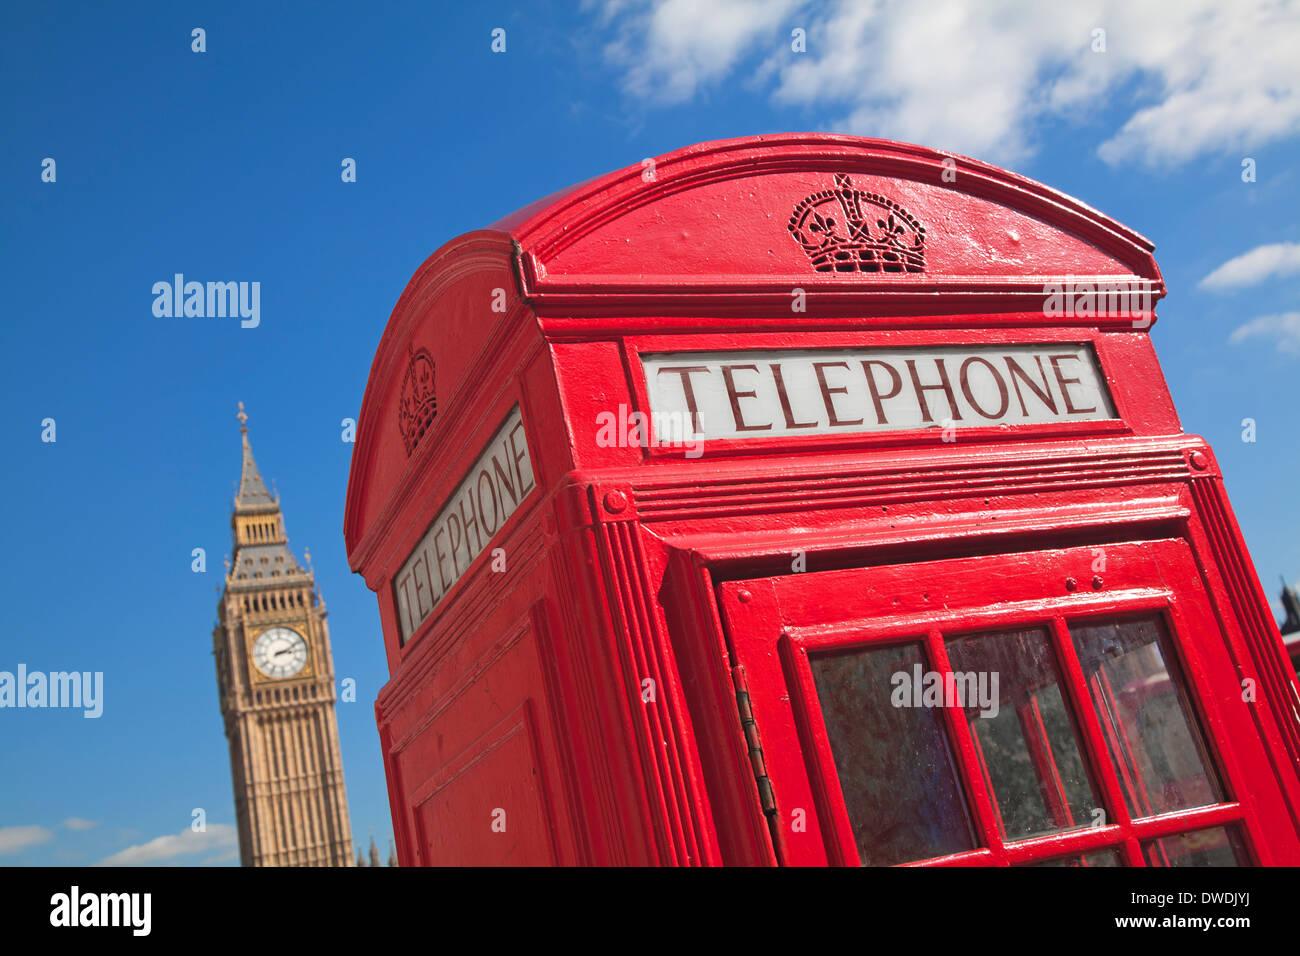 Red phone box in London UK - Stock Image